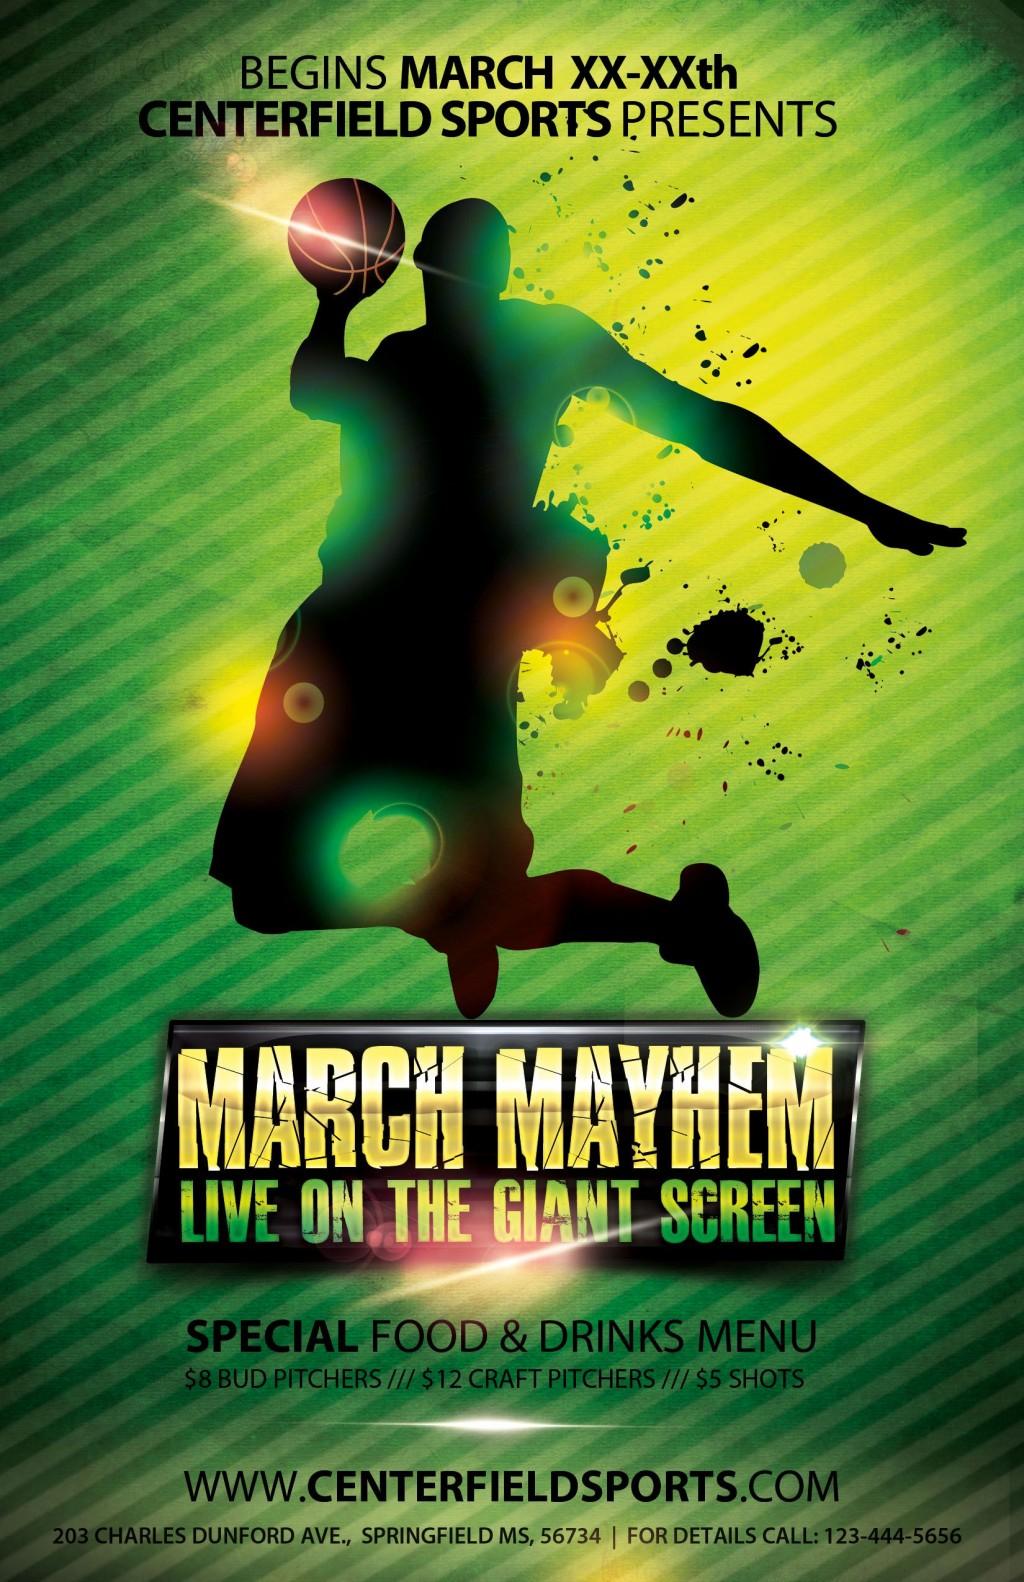 004 Impressive Basketball Flyer Template Free Sample  Brochure Tryout CampLarge